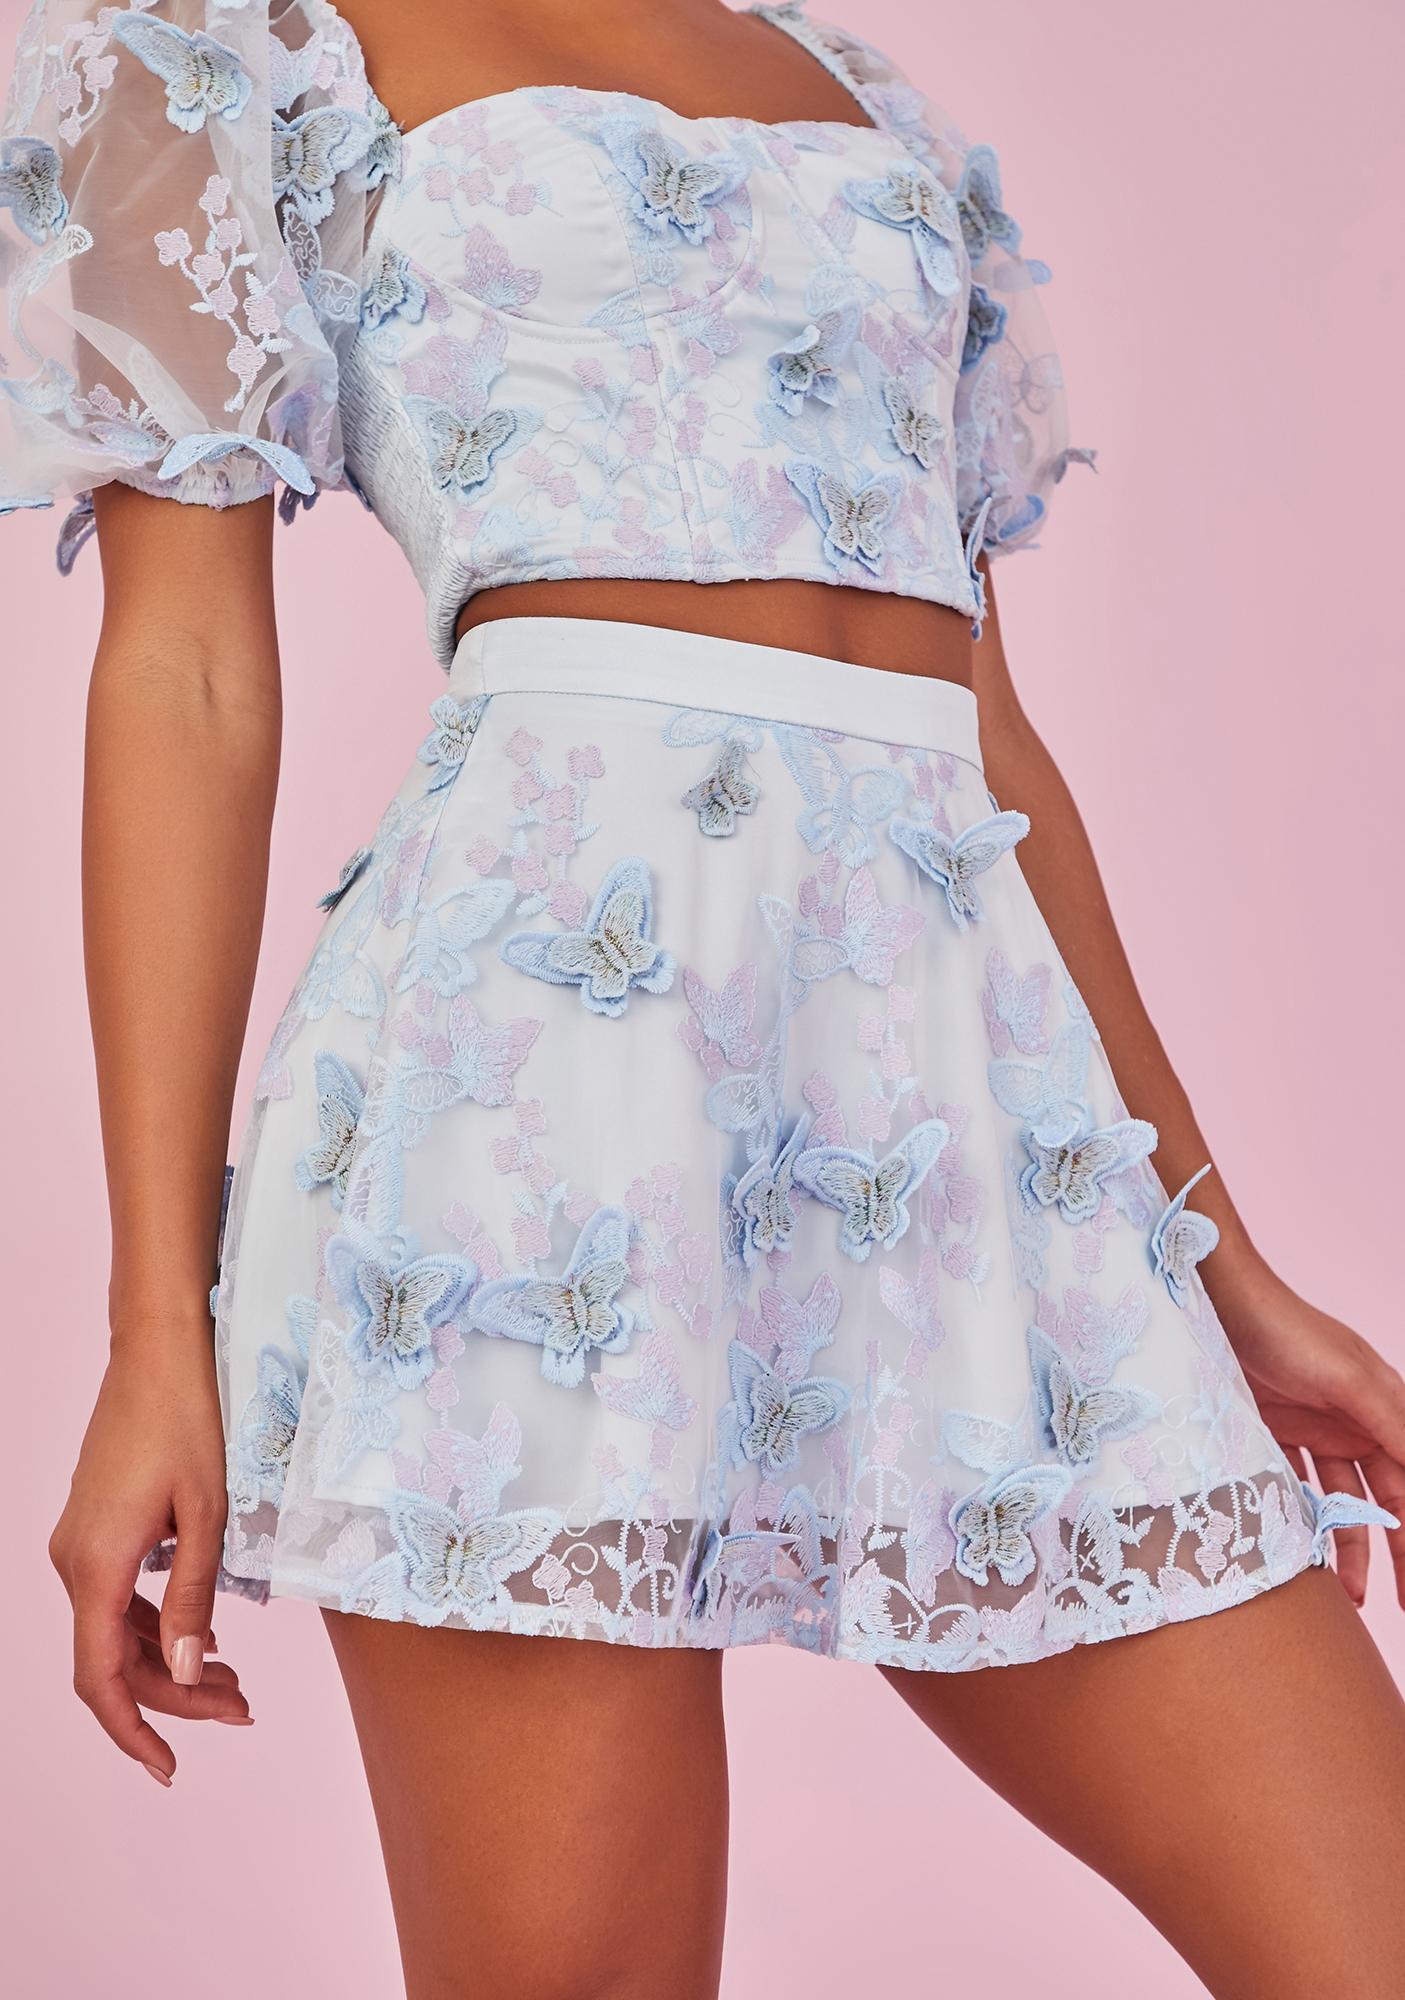 Sugar Thrillz Take Me Away Butterfly Mini Skirt